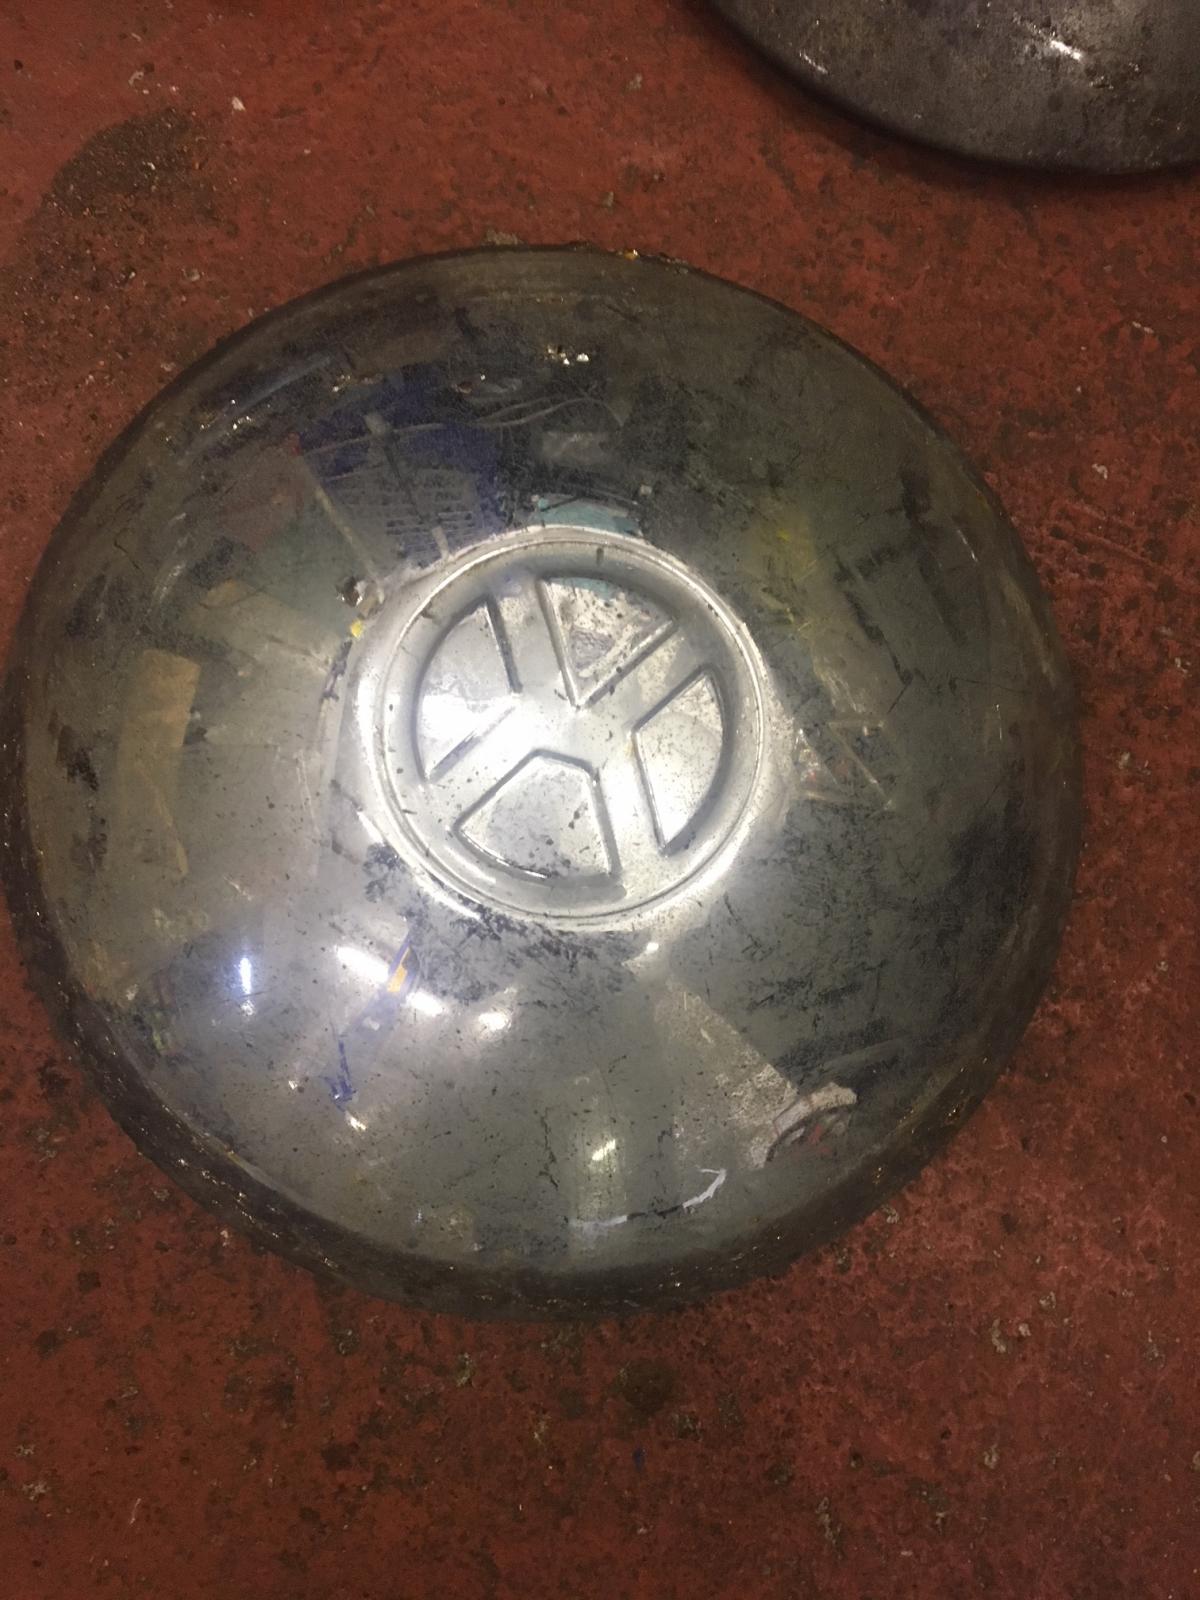 Unidentified hubcap